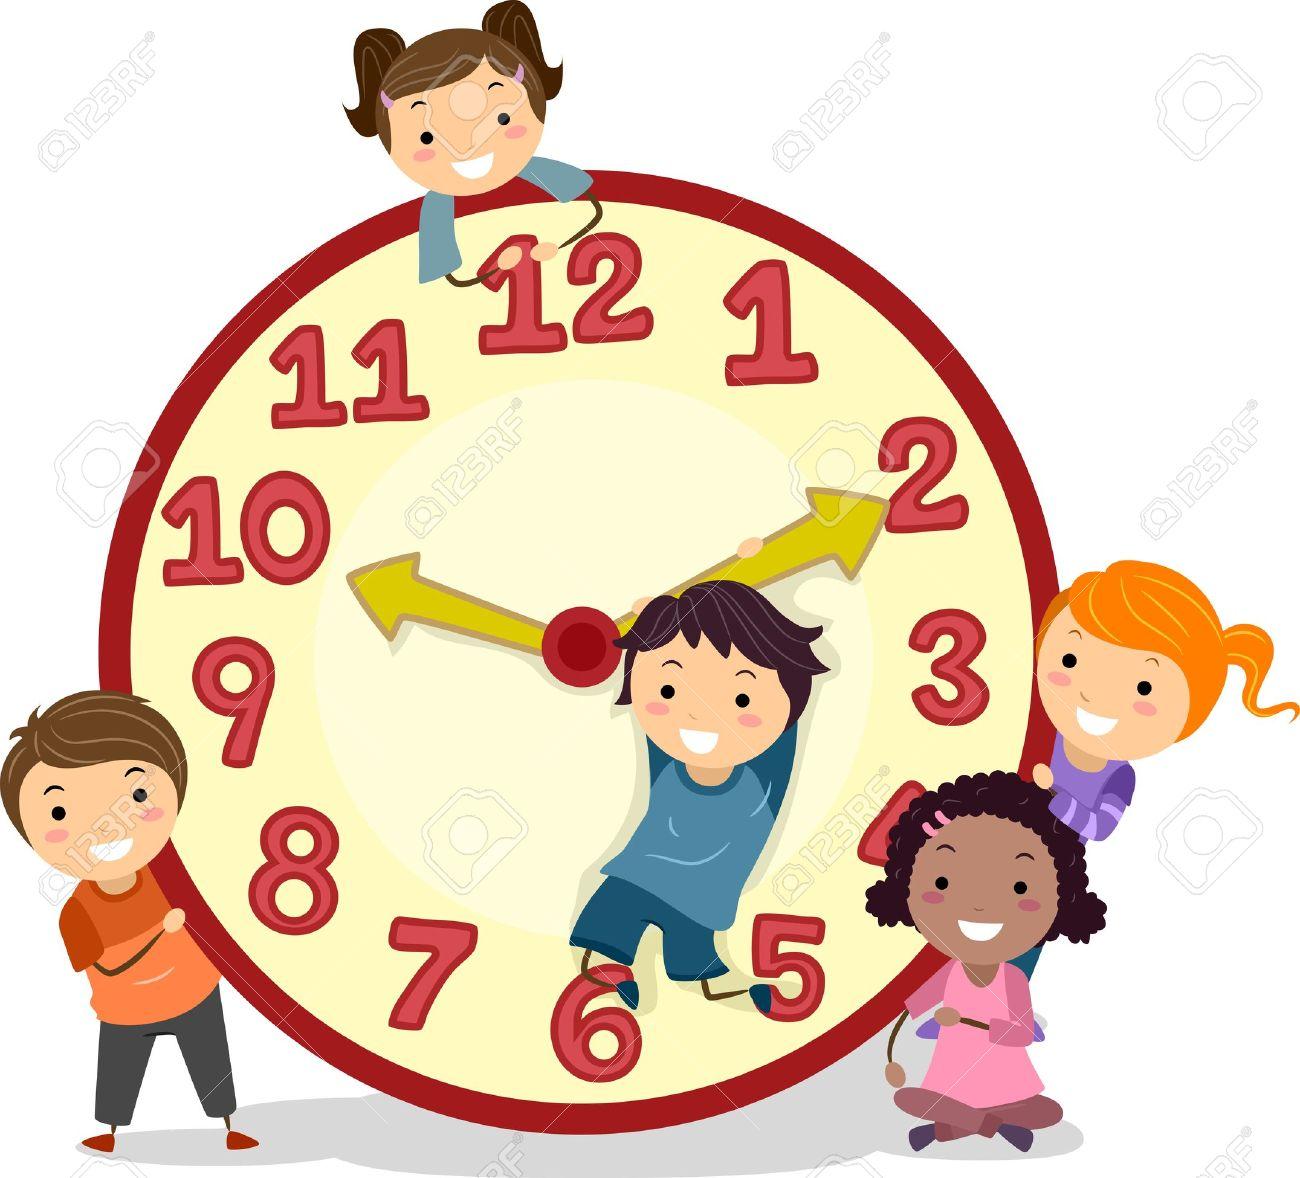 Image From Http Previews 123rf Com Images Lenm Lenm1304 Lenm130400207 19109447 Illustration Of Stickman Kids On A Big Clock Stock Illustration Clock Cartoon C